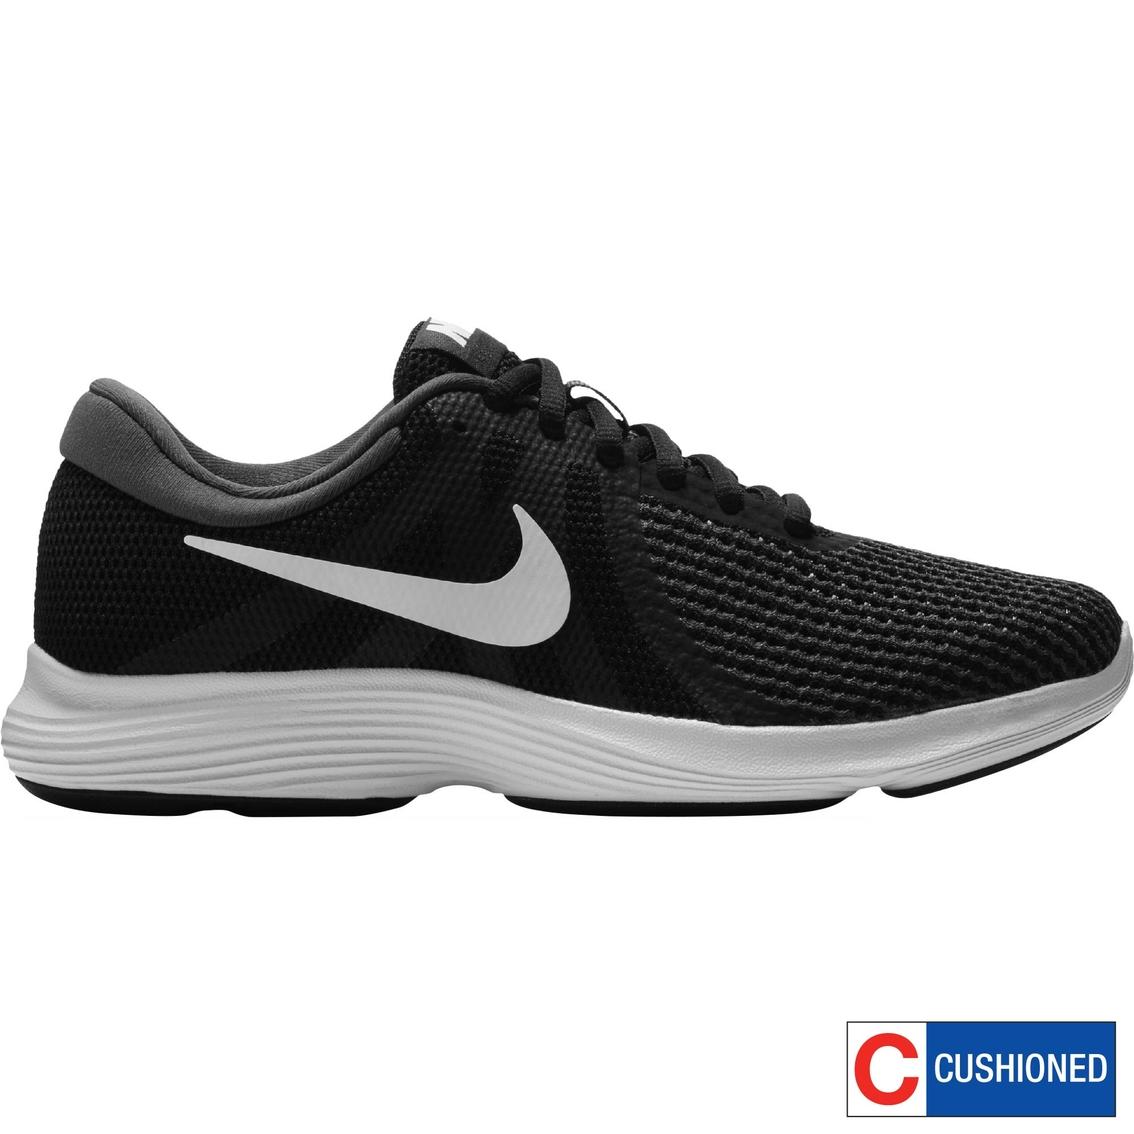 21139a6a83b Nike Women s Flex Experience Rn 7 Running Shoes